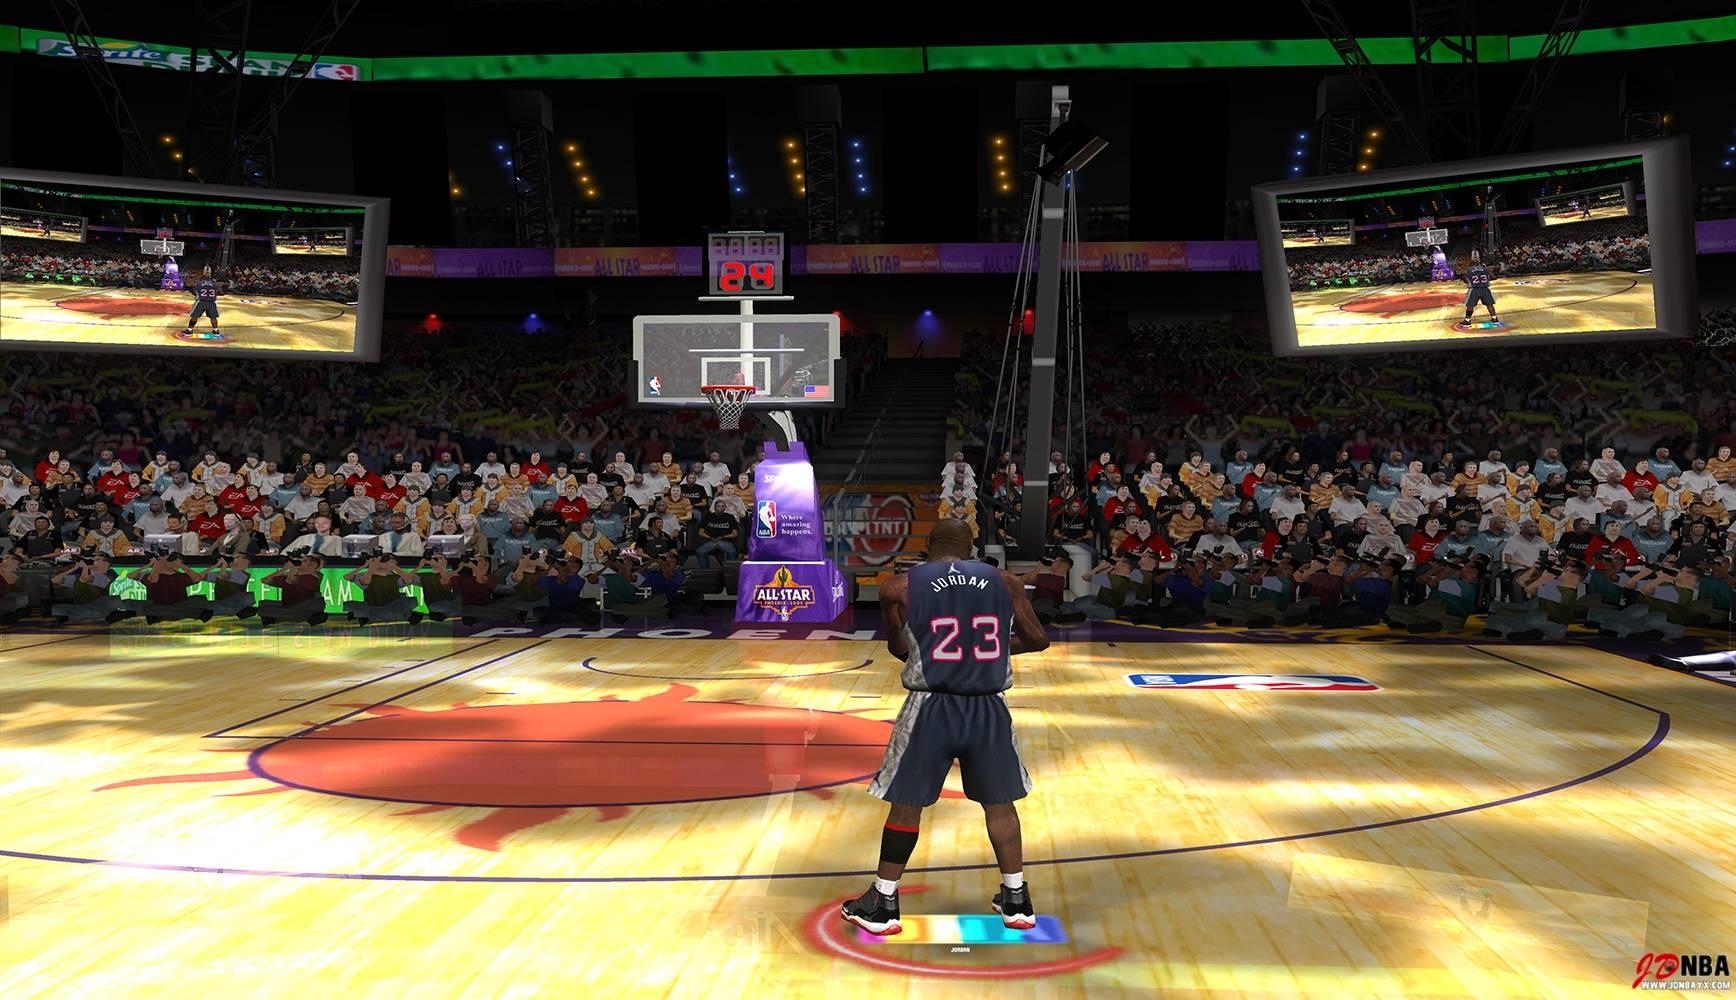 NBA LIVE 09【4K】-2021-08-27-01-45-04-140副本.jpg